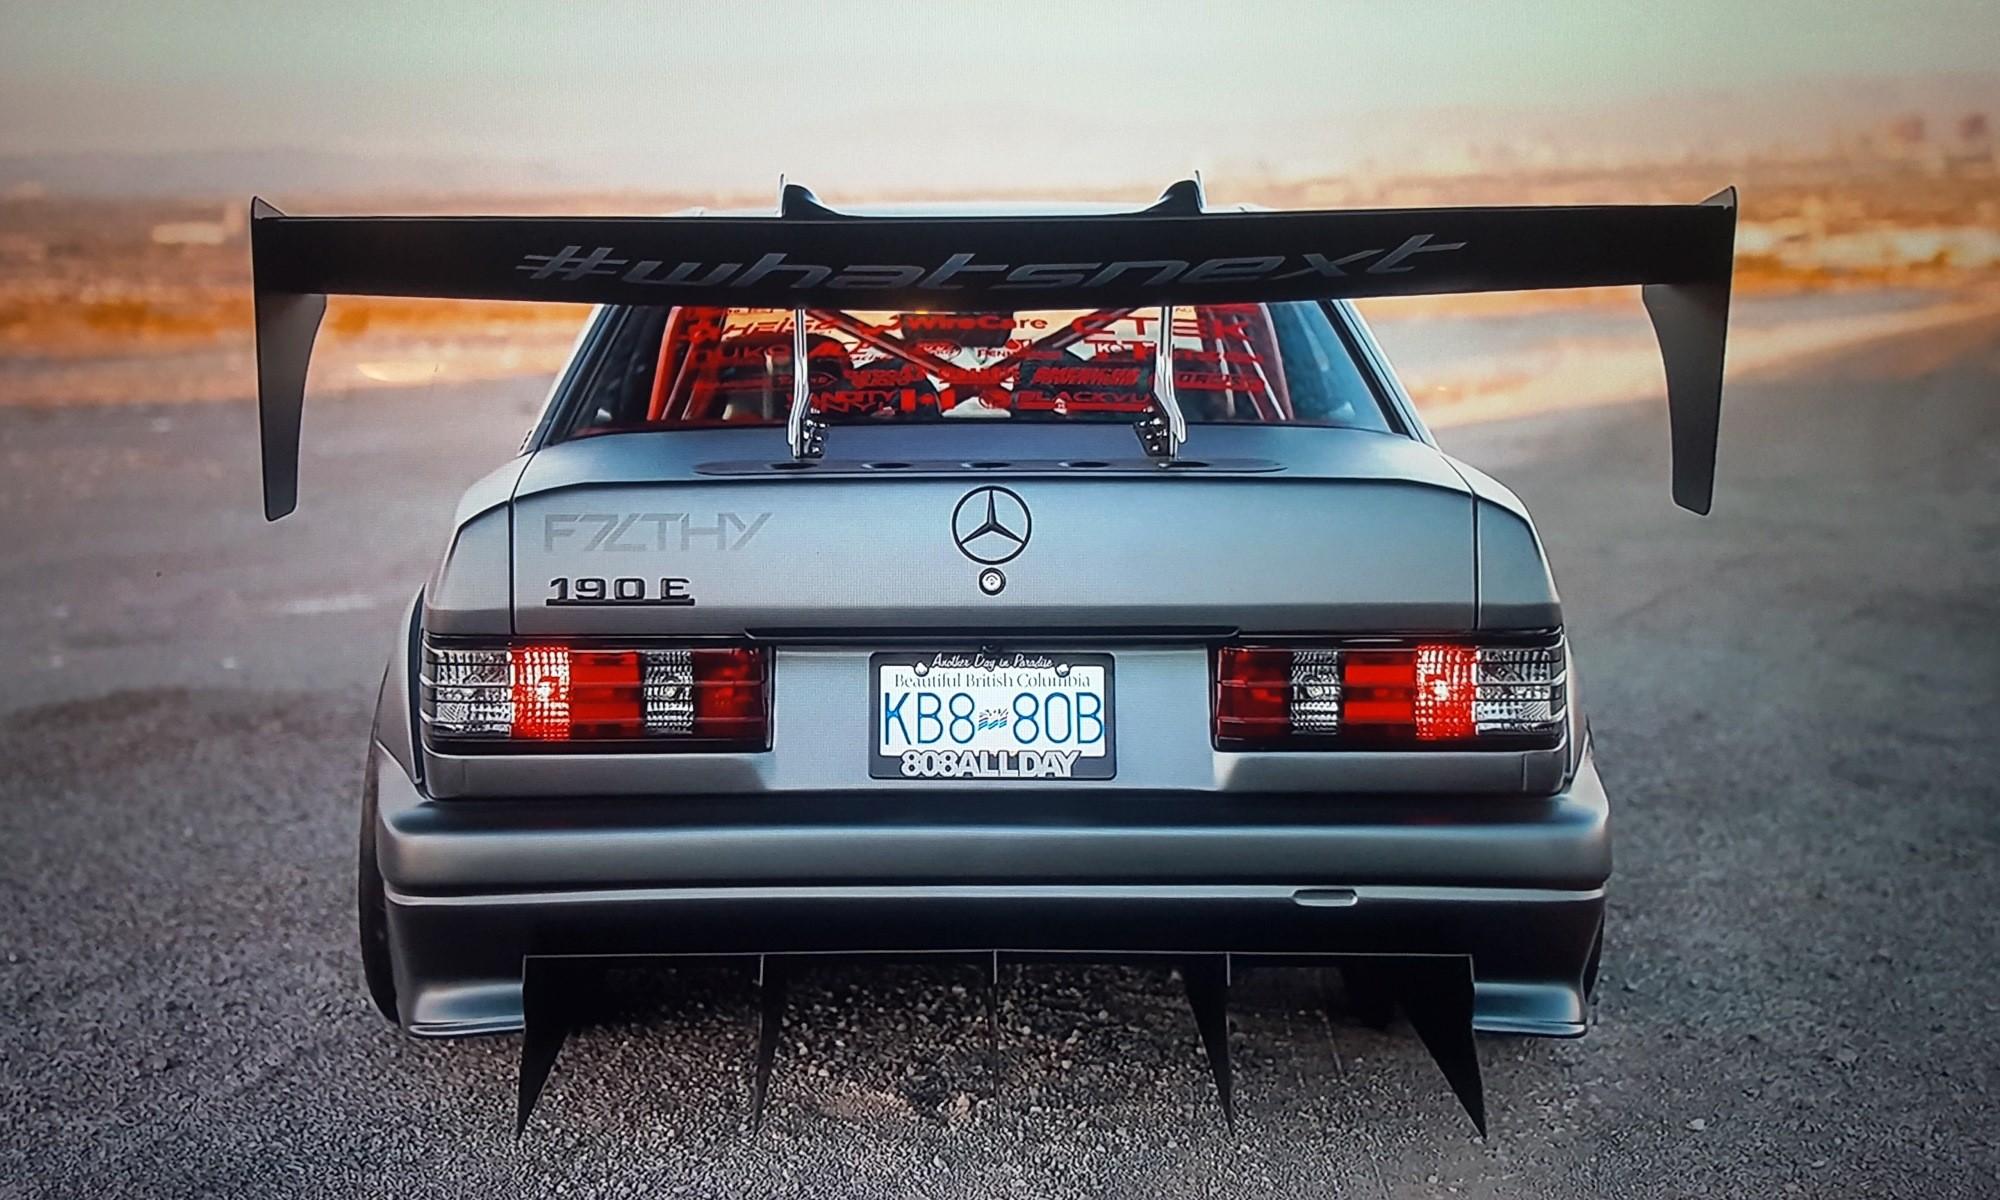 V8TT Mercedes 190E Evo wing